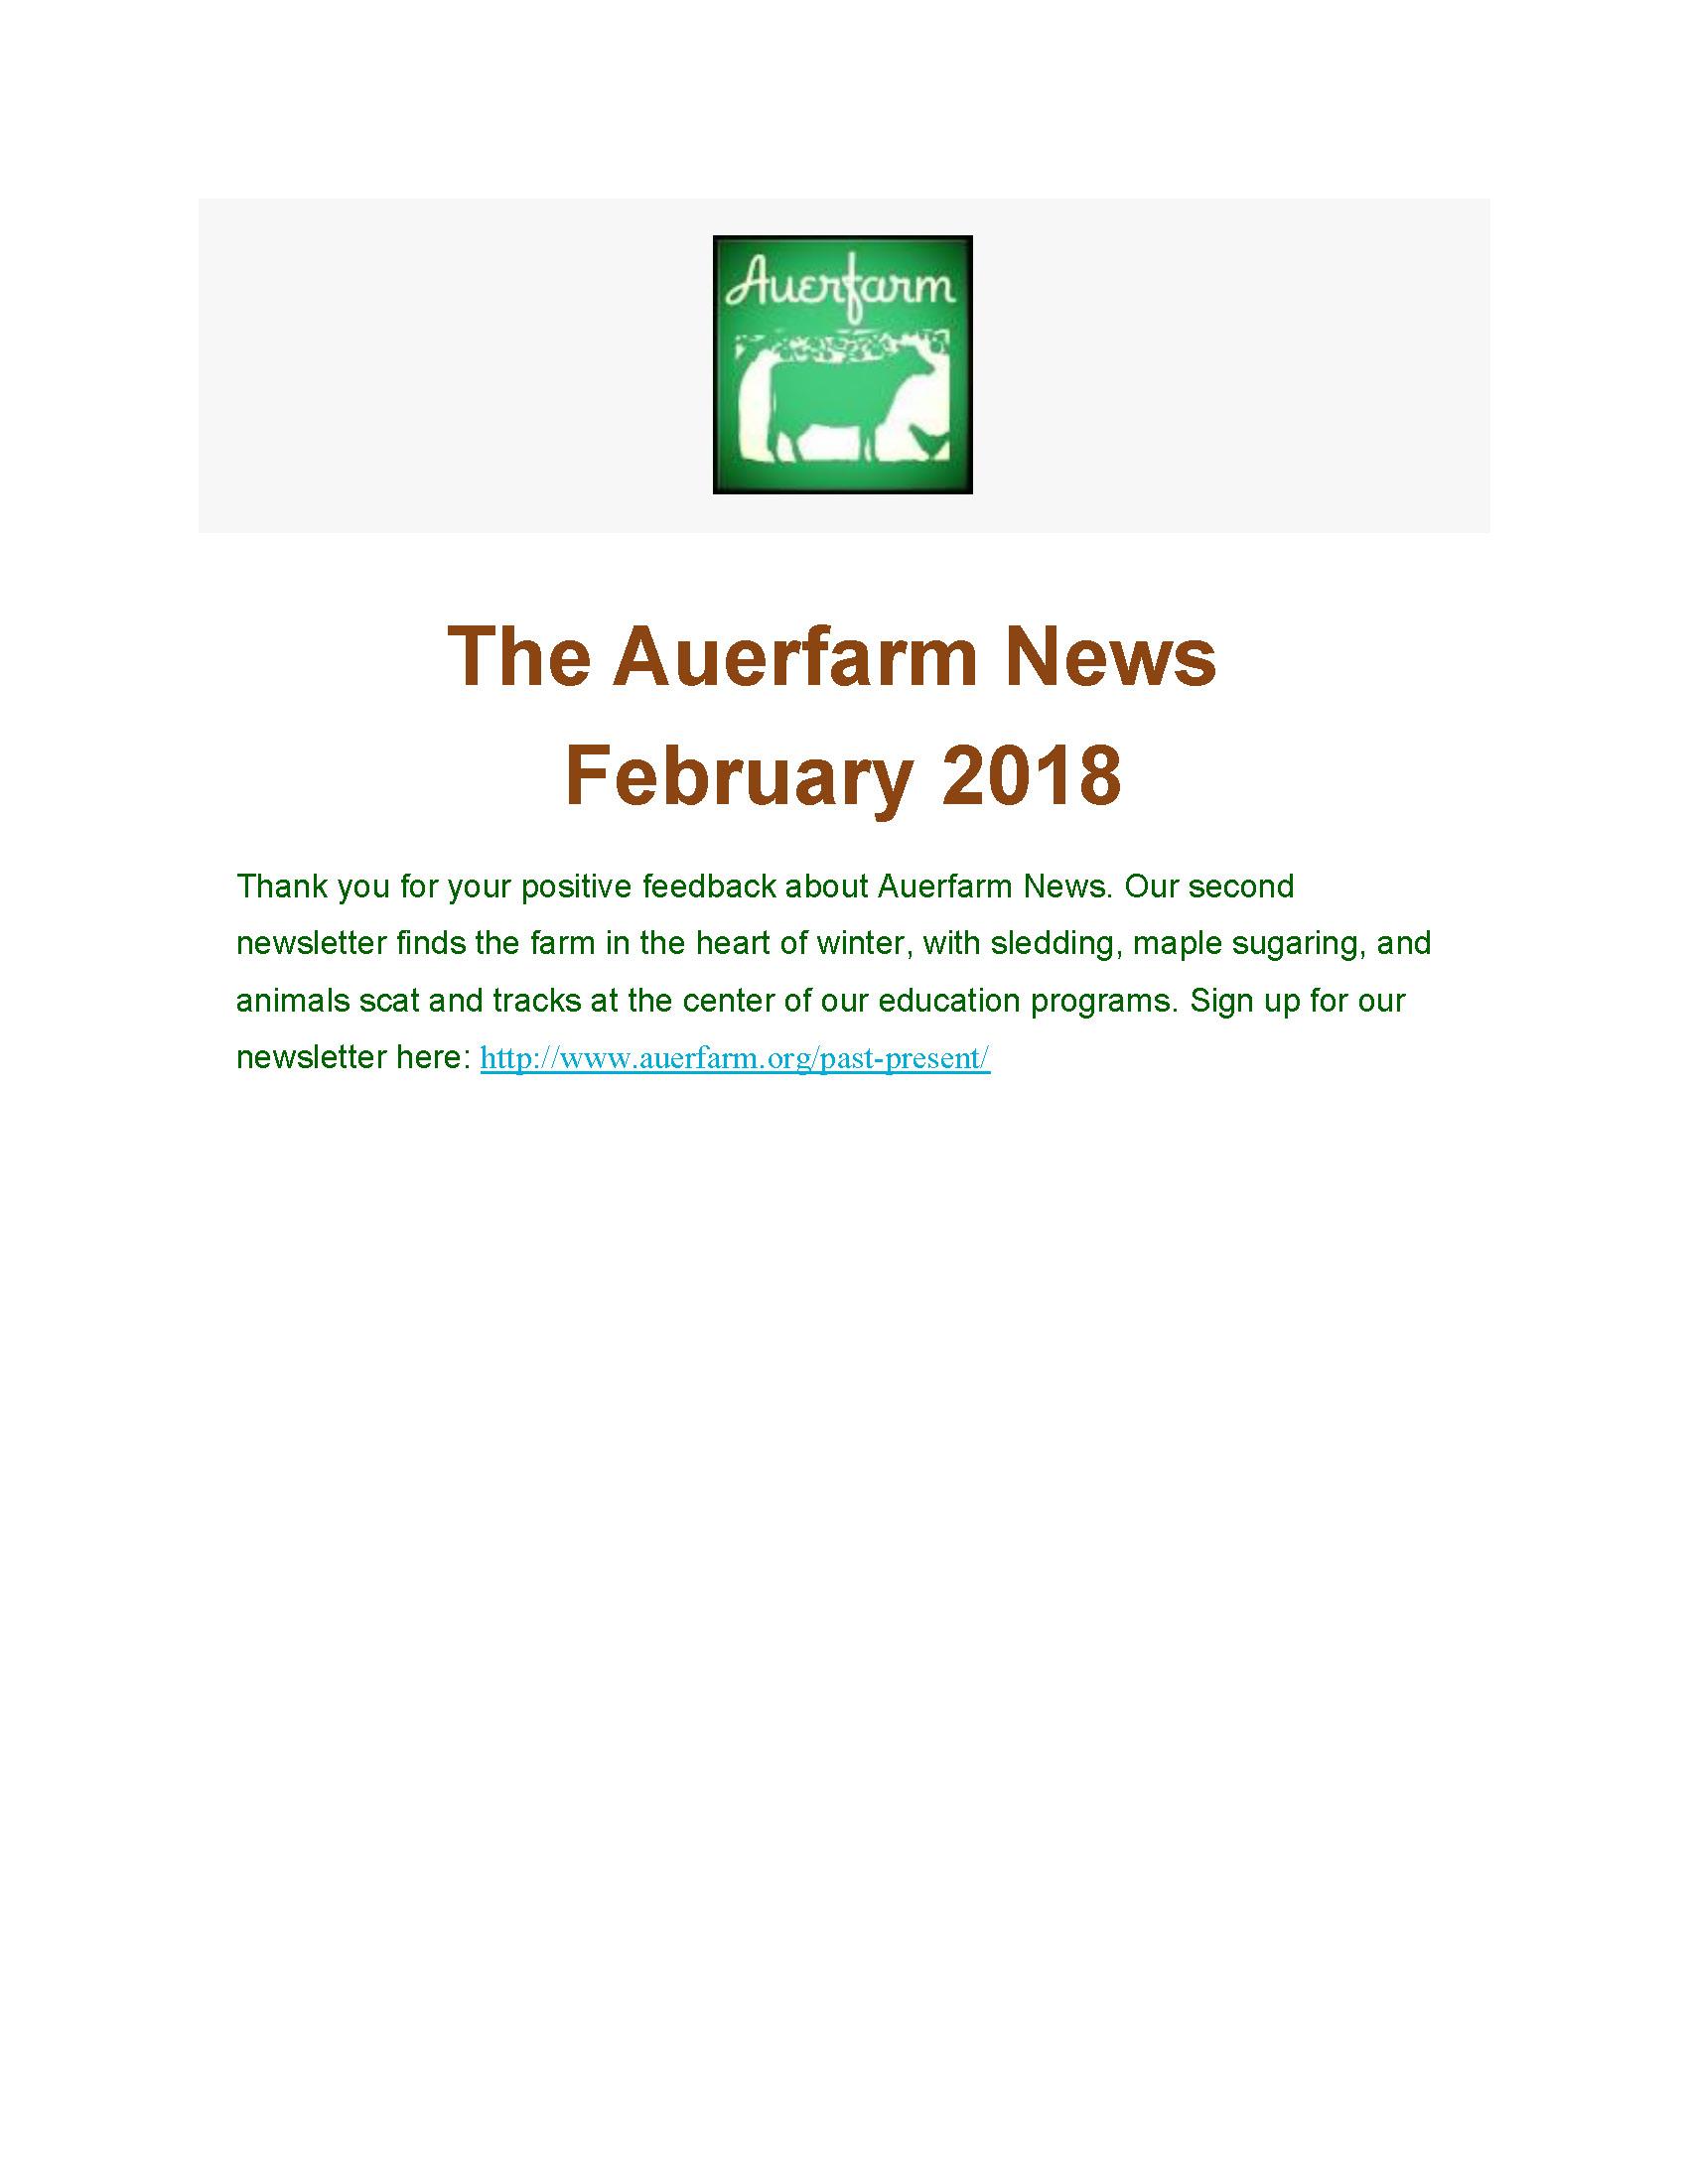 The Auerfarm News_Page_1.jpg